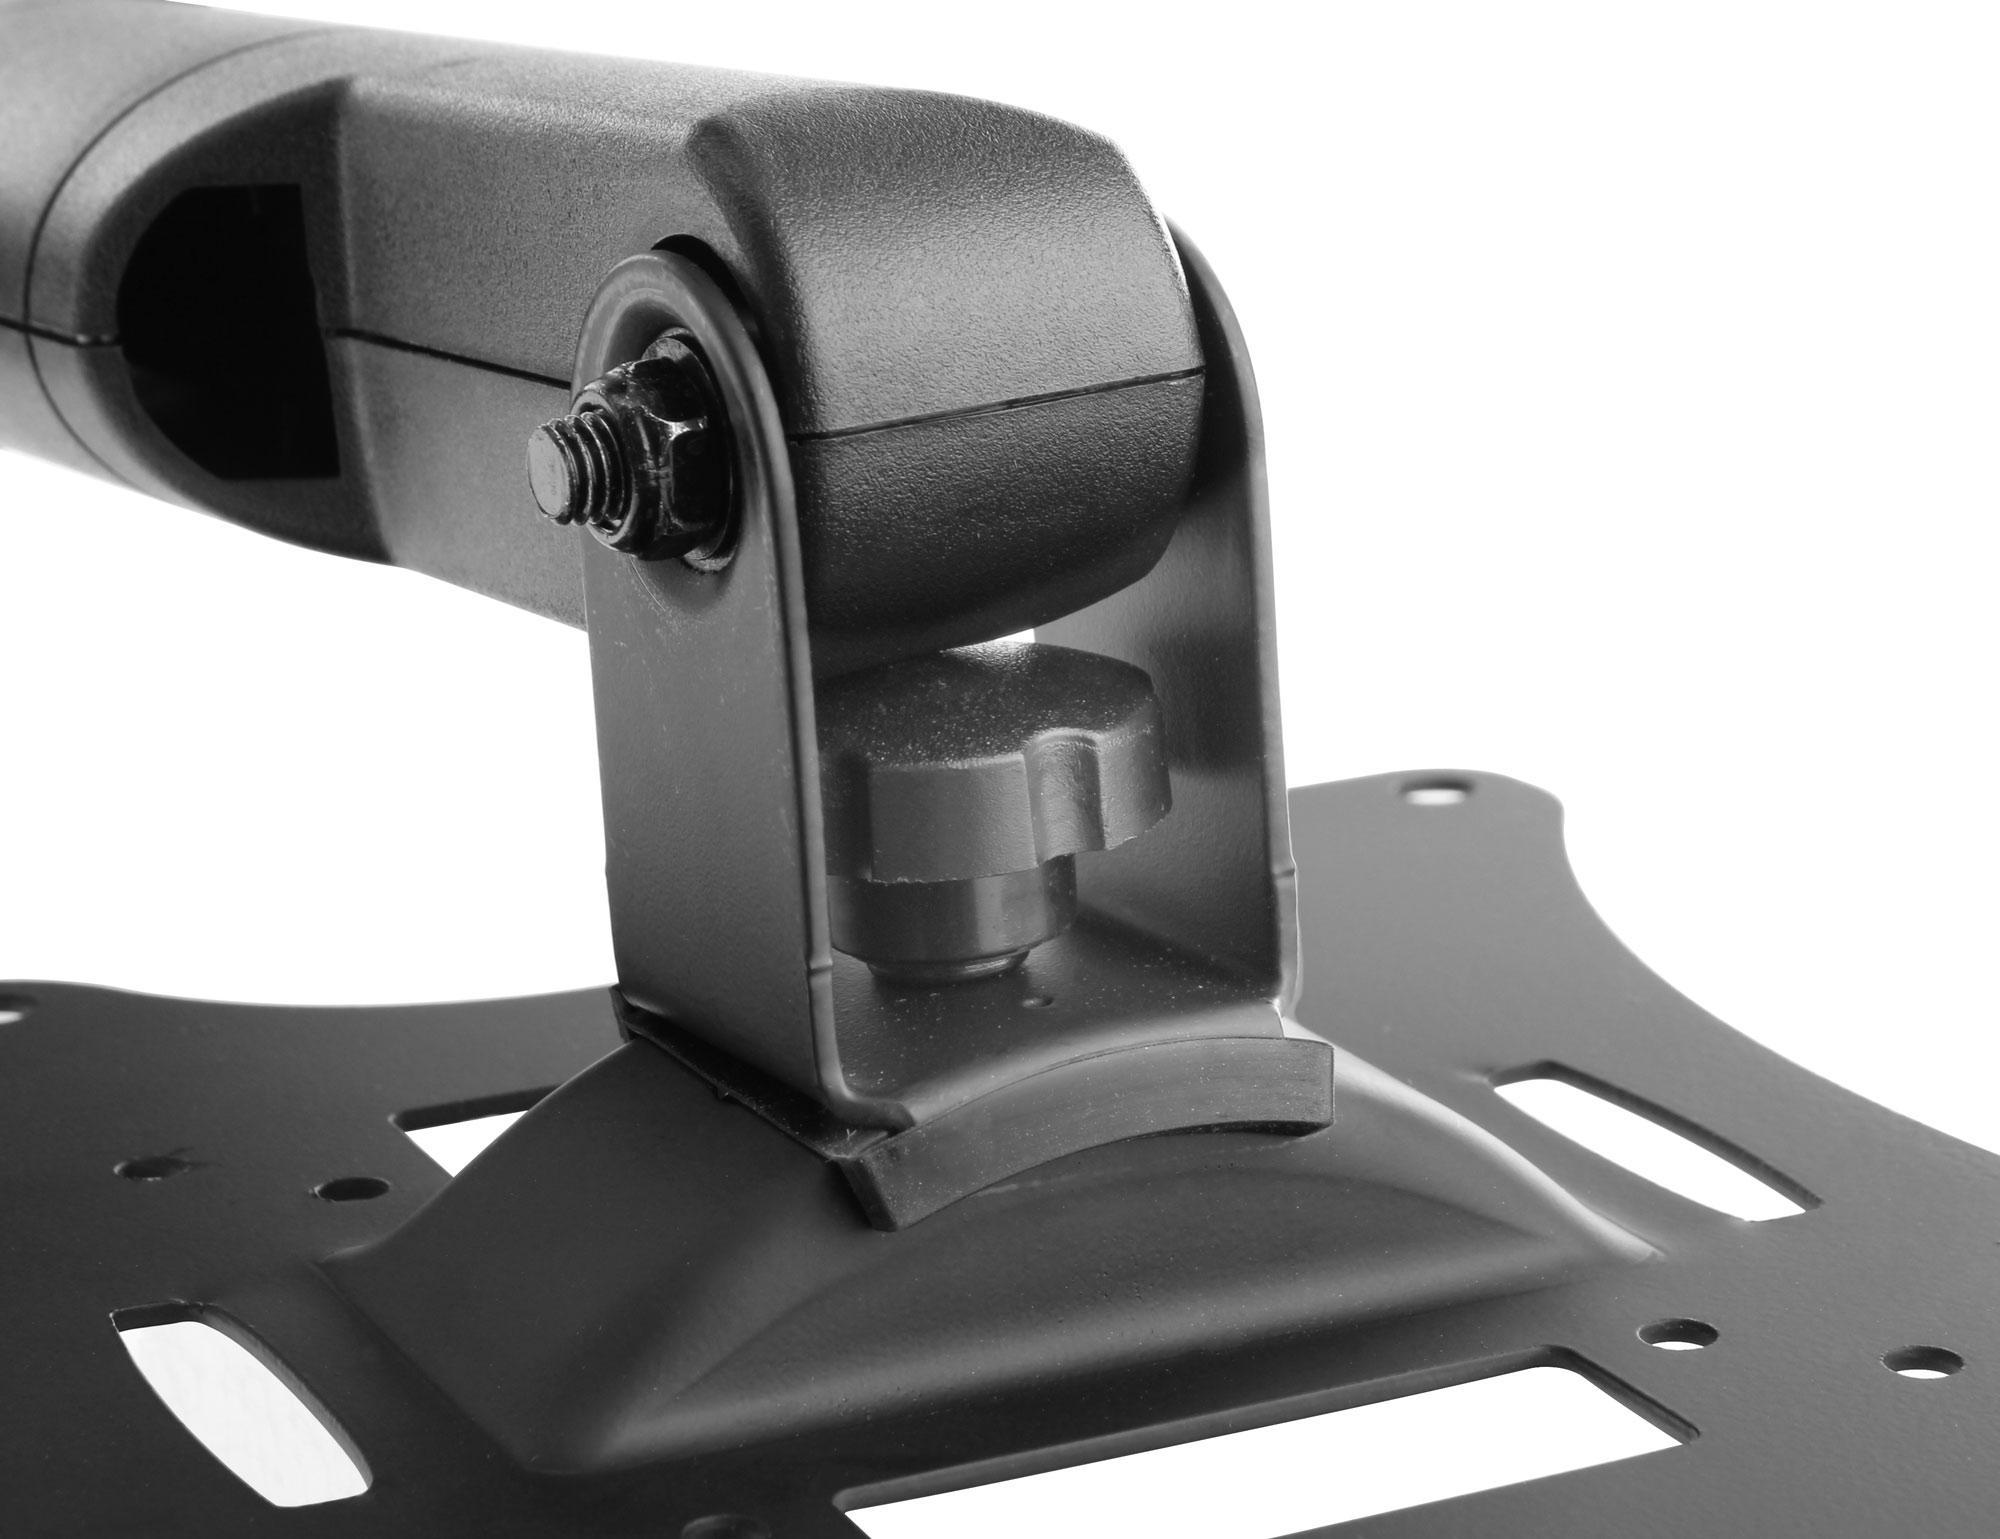 pronomic fpwm 502a schwenkarm wandhalterung f r lcd tv ger te inkl montagematerial. Black Bedroom Furniture Sets. Home Design Ideas